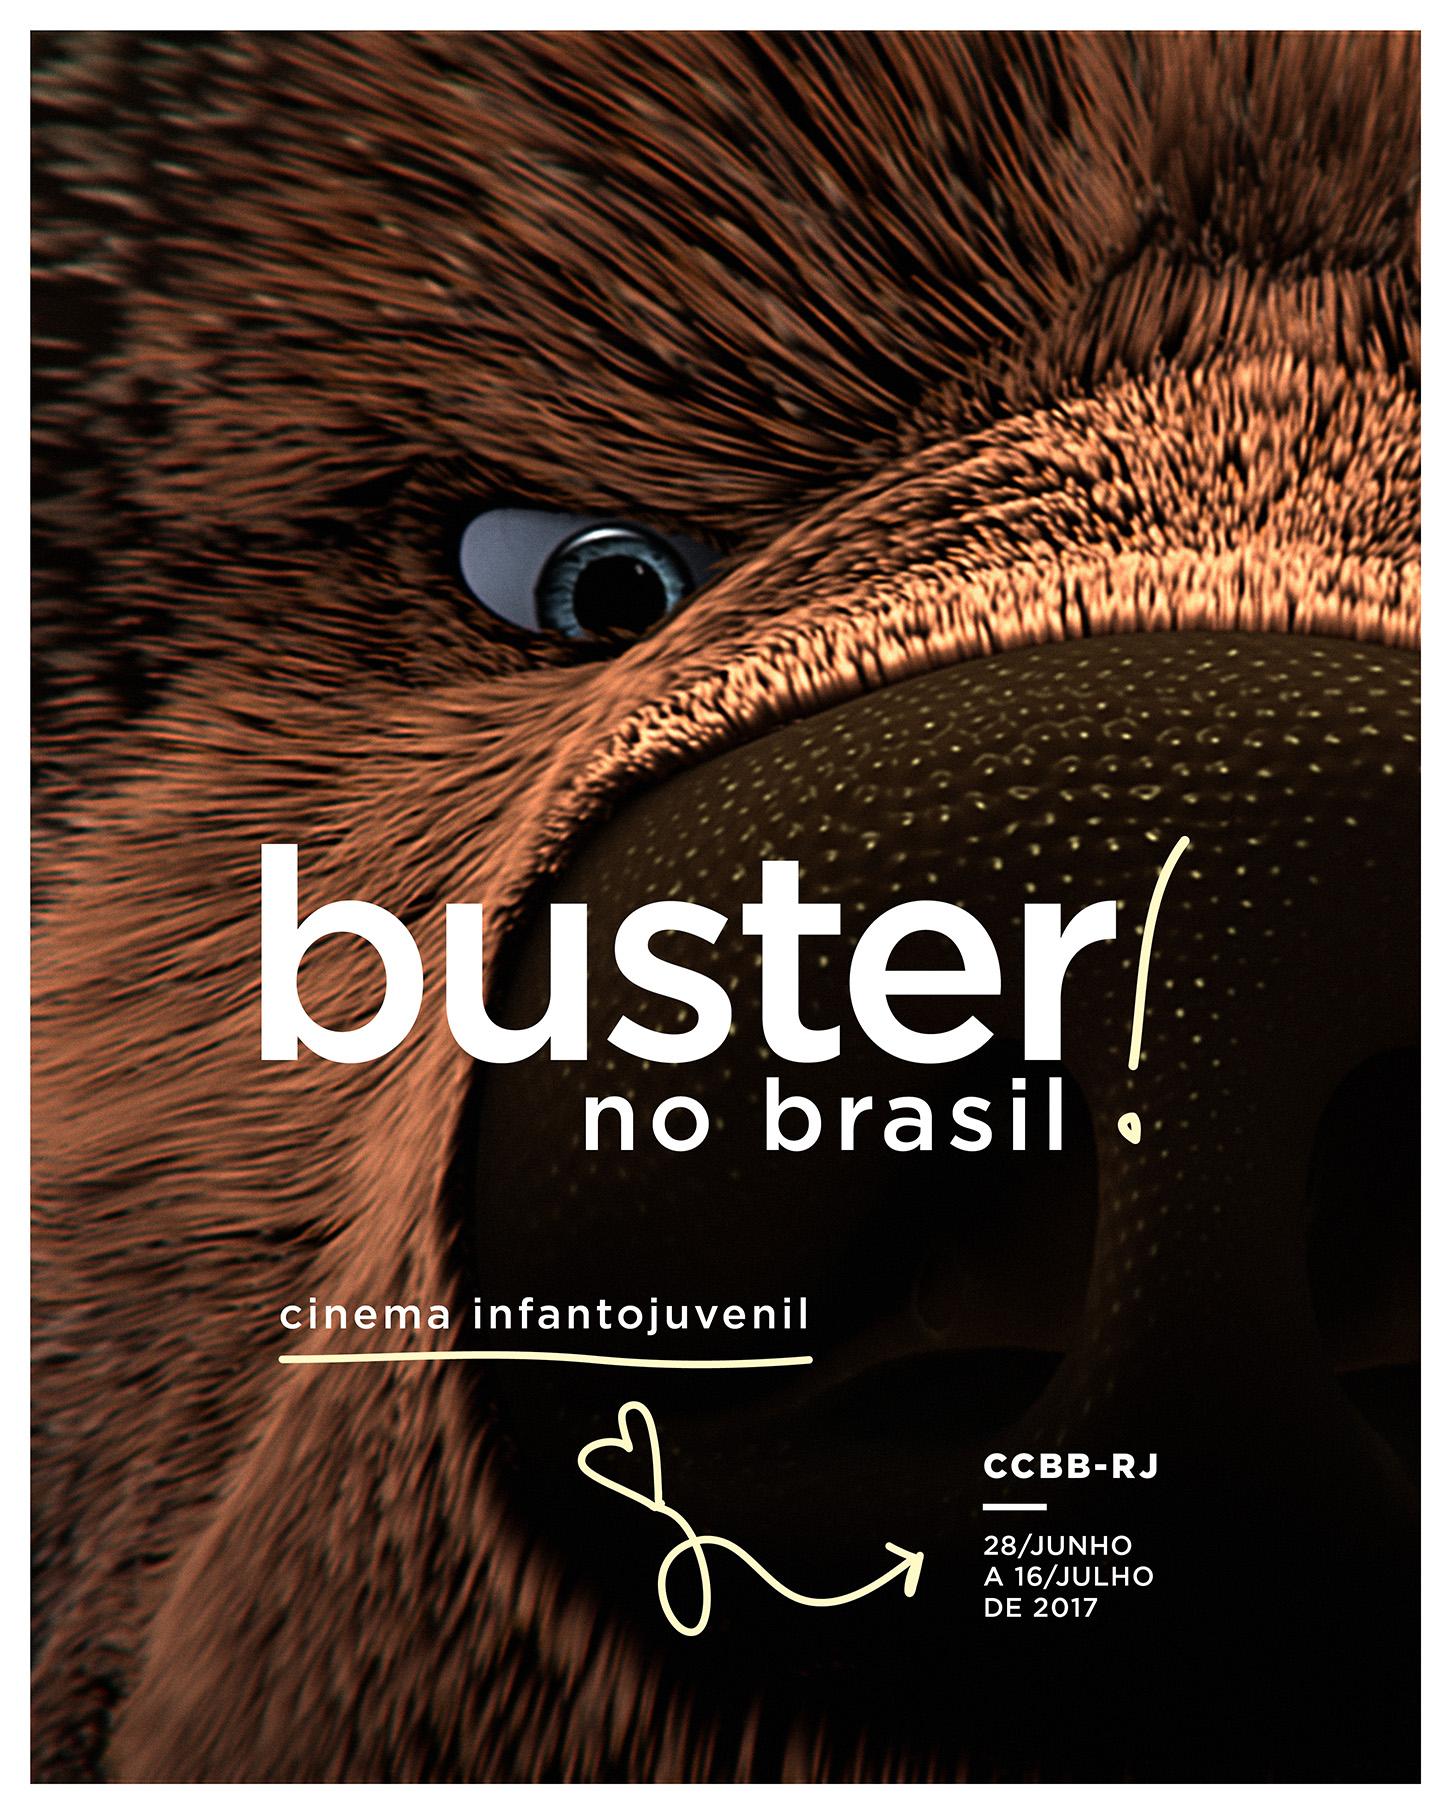 Buster no Brasil - RJ